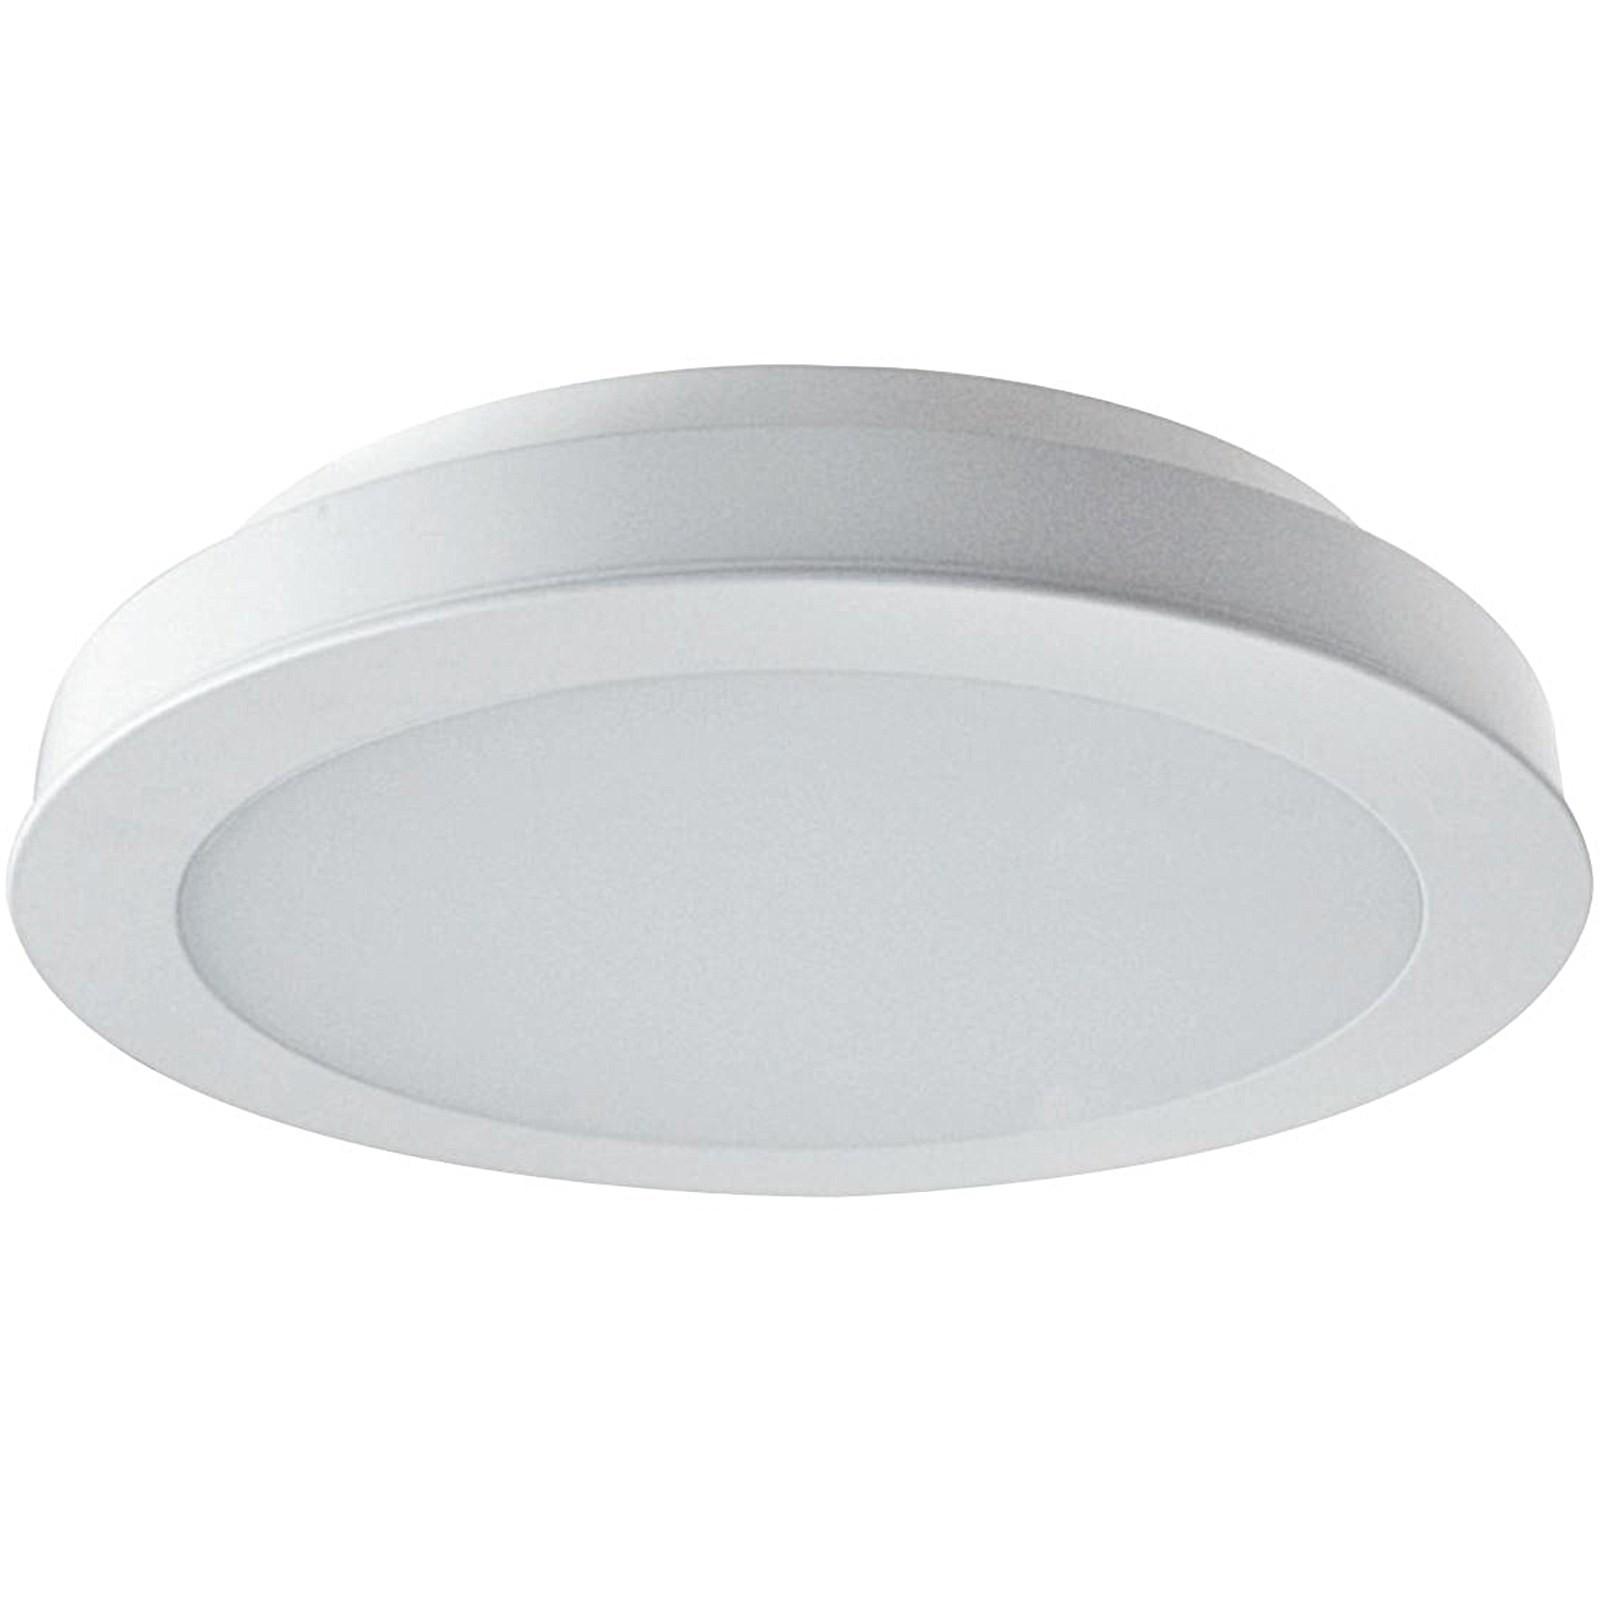 Faro faretto pannello led luce bianca natura naturale 25w for Luce bianca led